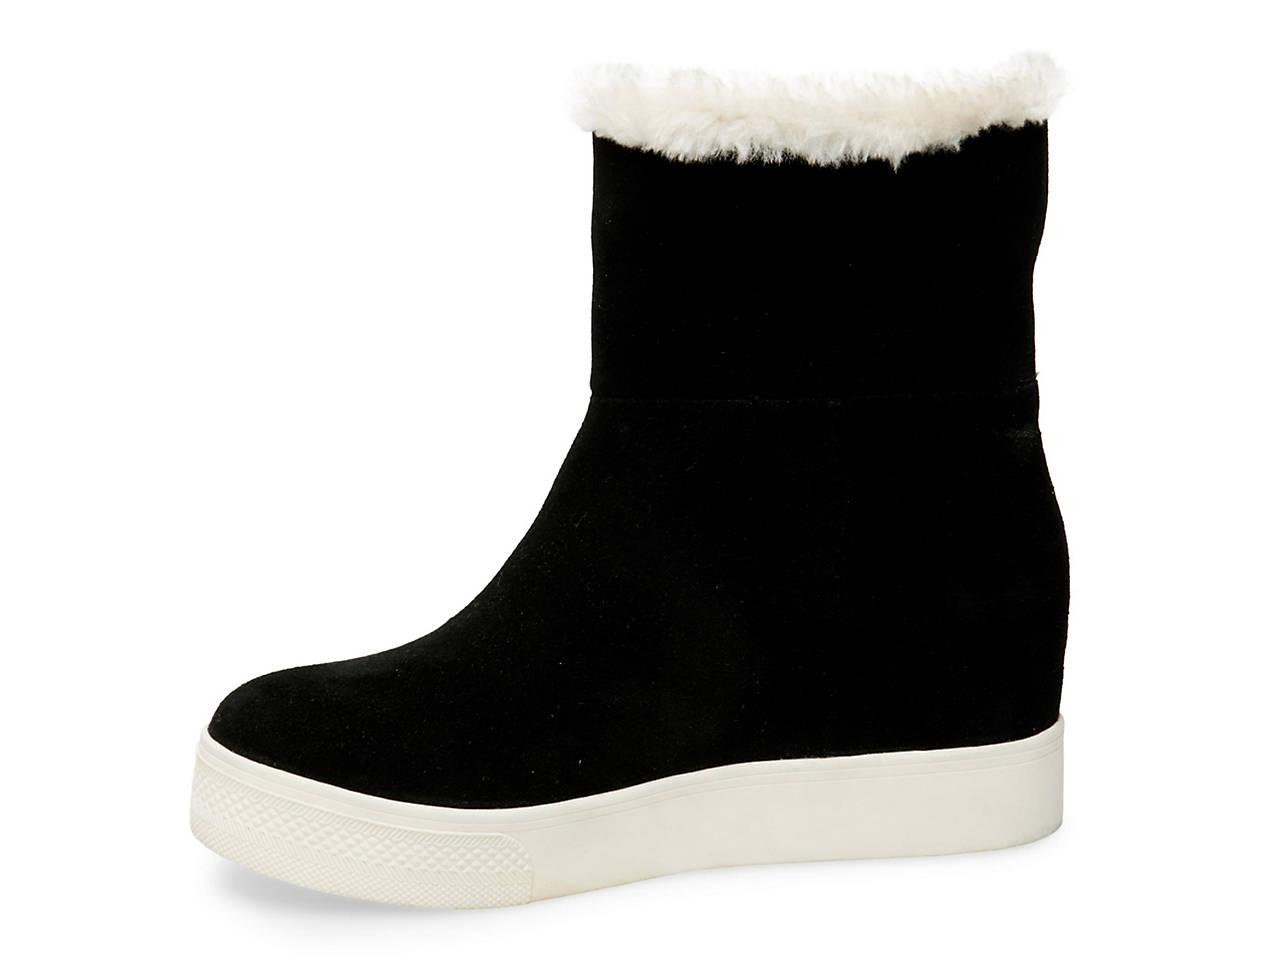 6652e03faf6 Steve Madden Weston Wedge Bootie Women s Shoes